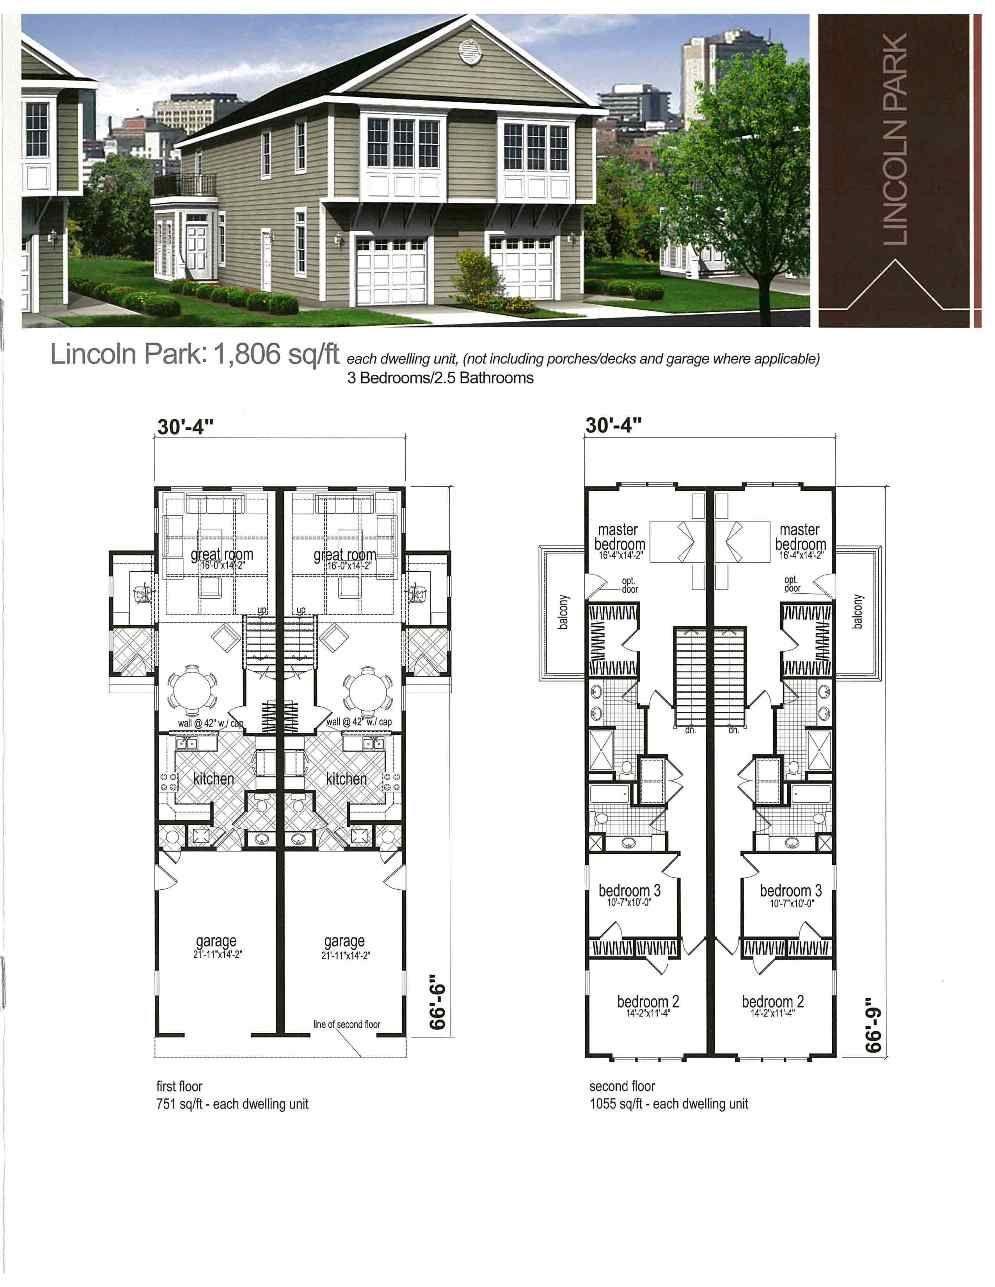 Duplex plan duplex fourplex plans pinterest duplex for Apartment fourplex plans